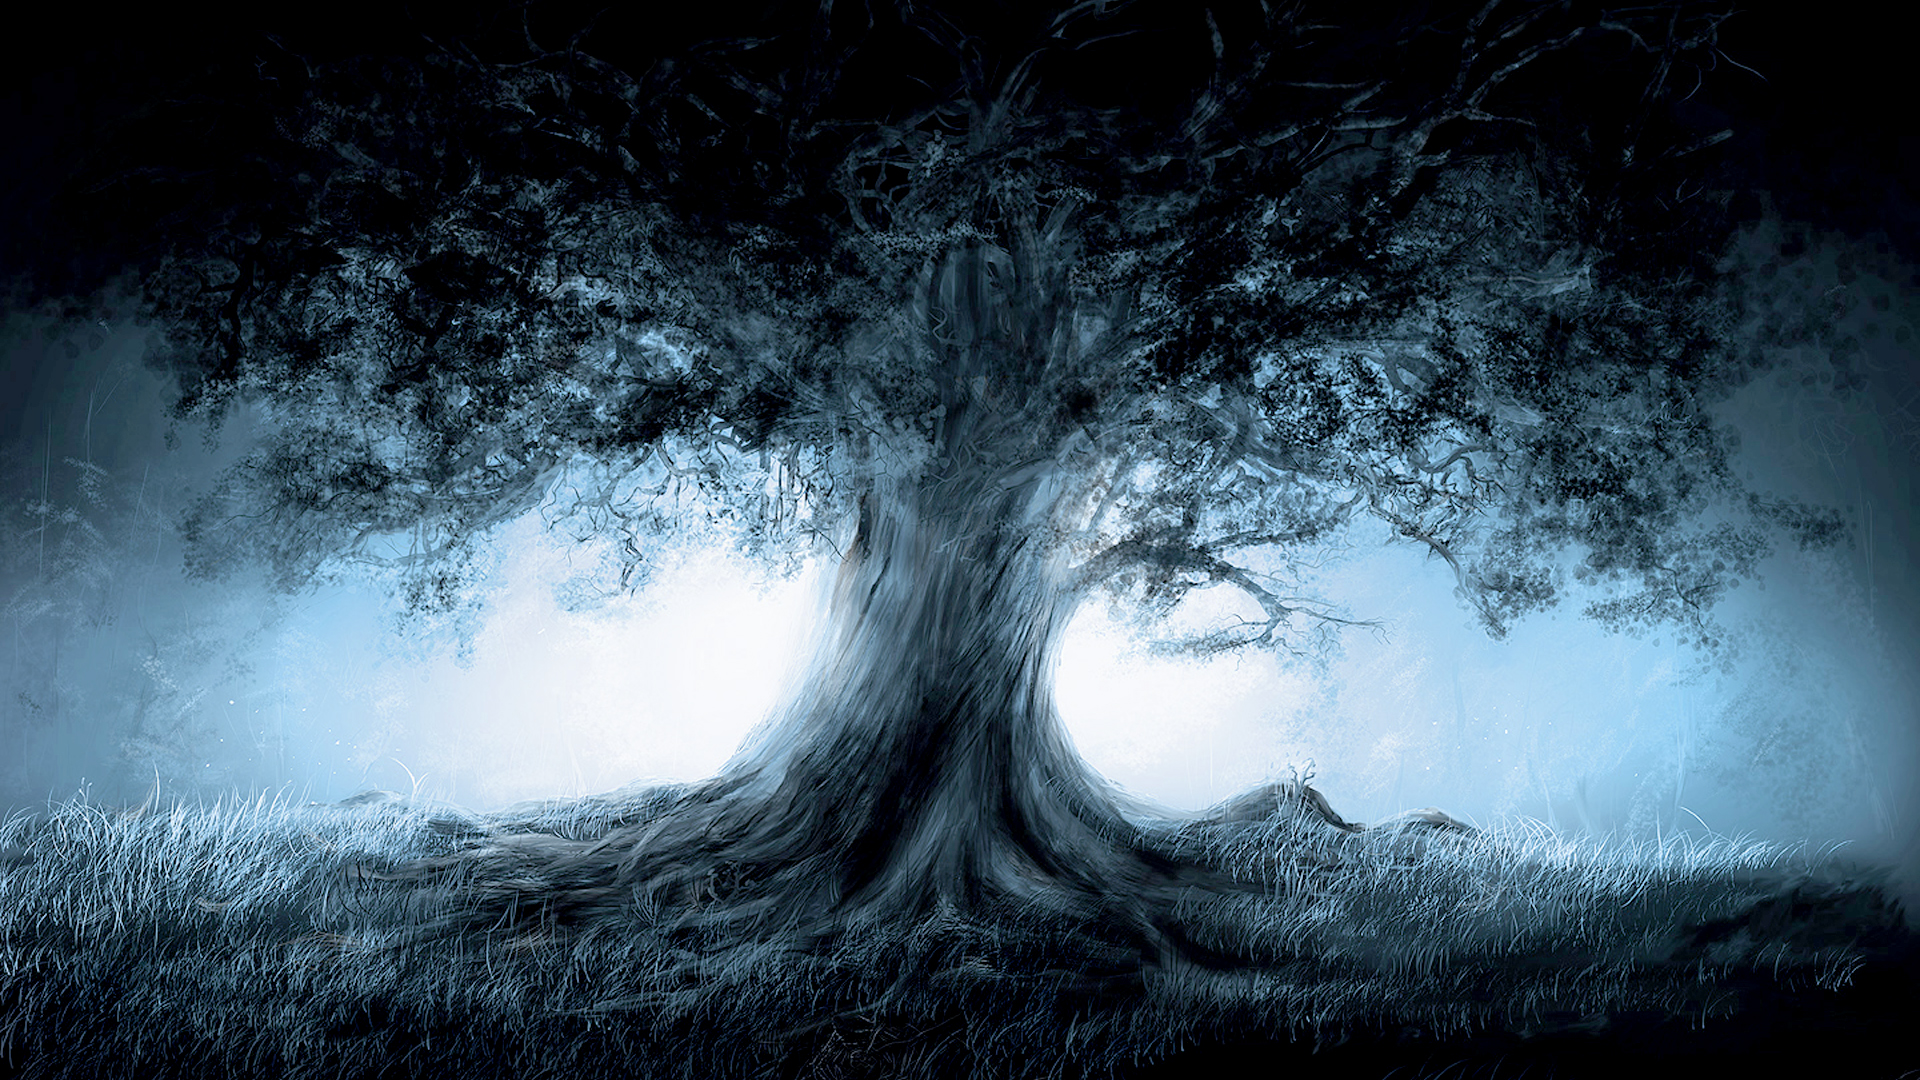 Trees Magic Wallpaper 1920x1080 Trees Magic 1920x1080